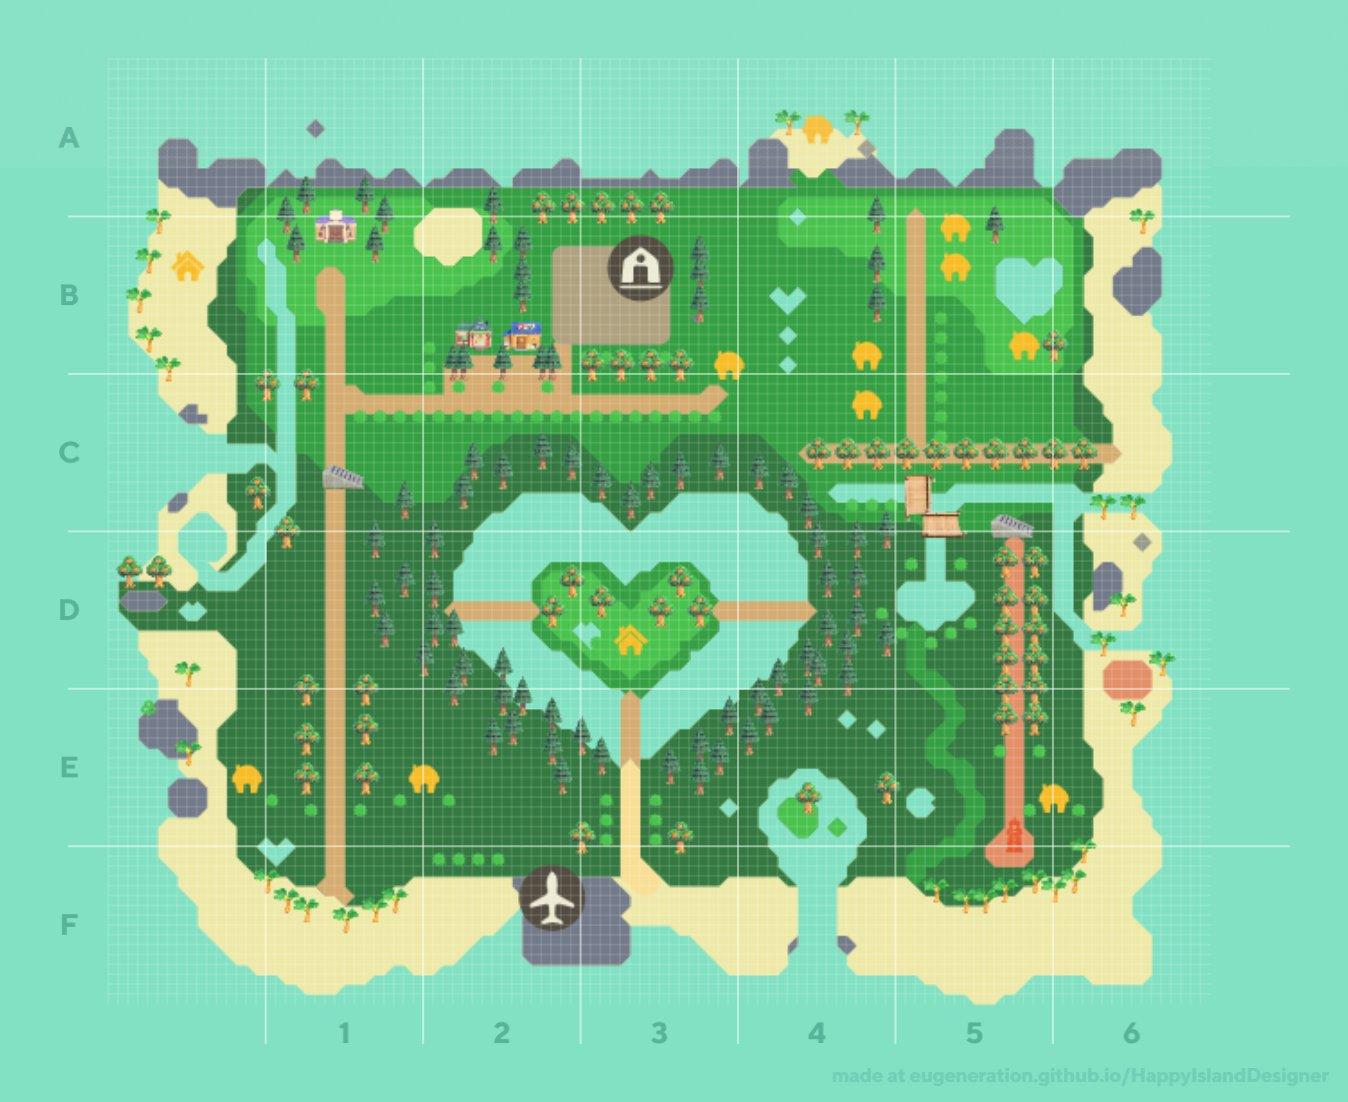 happy island designer guide